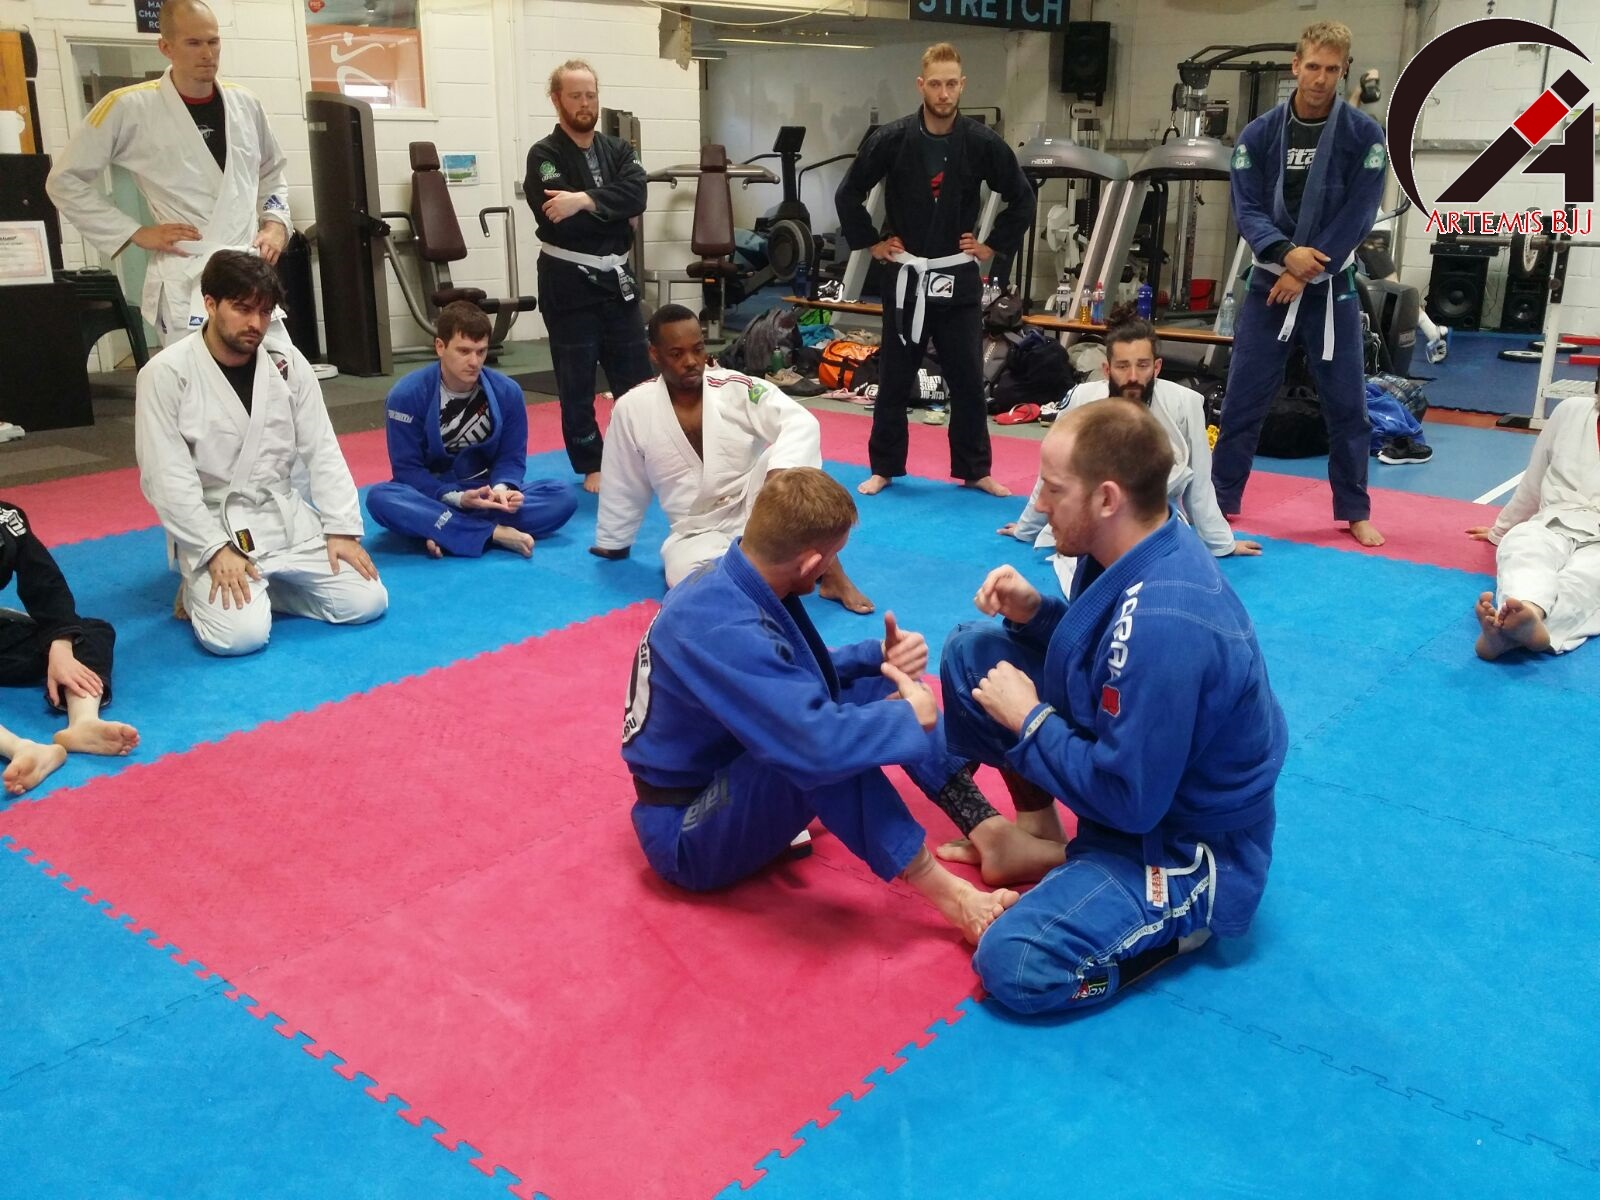 Grading Seminar with Kev Capel at Artemis BJJ Bristol Brazilian Jiu Jitsu